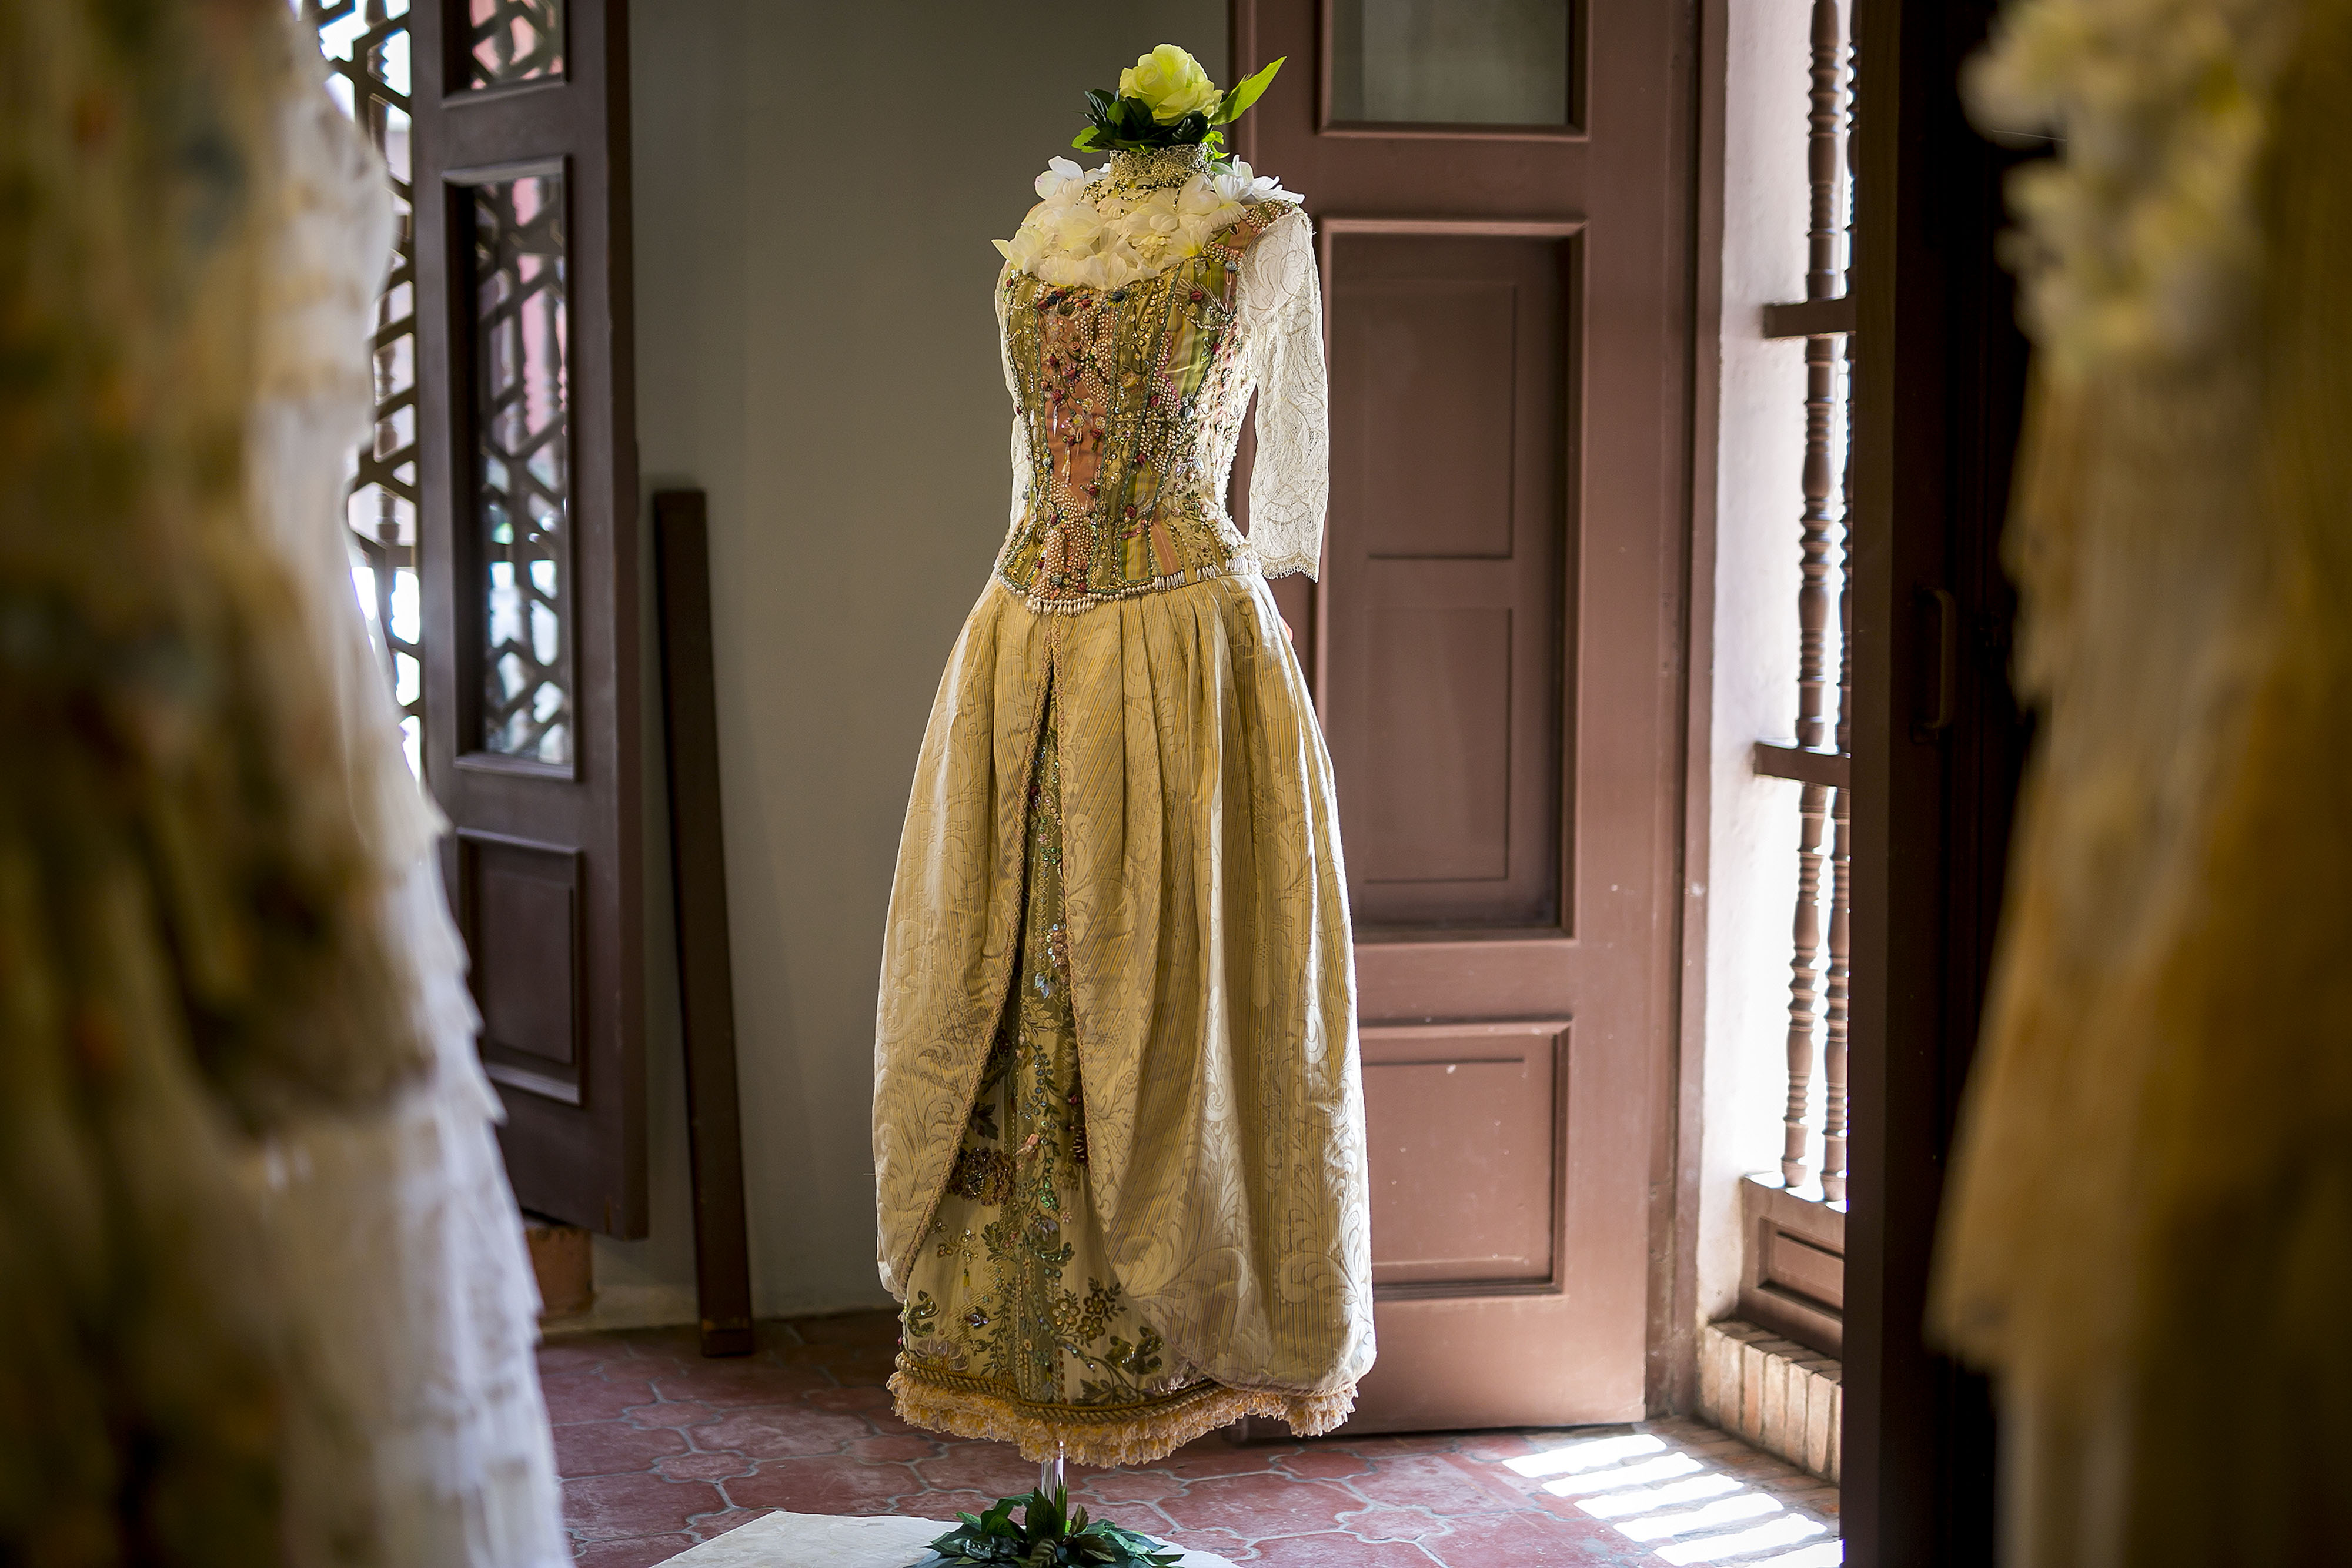 Vestido de novia de Caoppalli creado por Arango. (Foto: Xavier García)